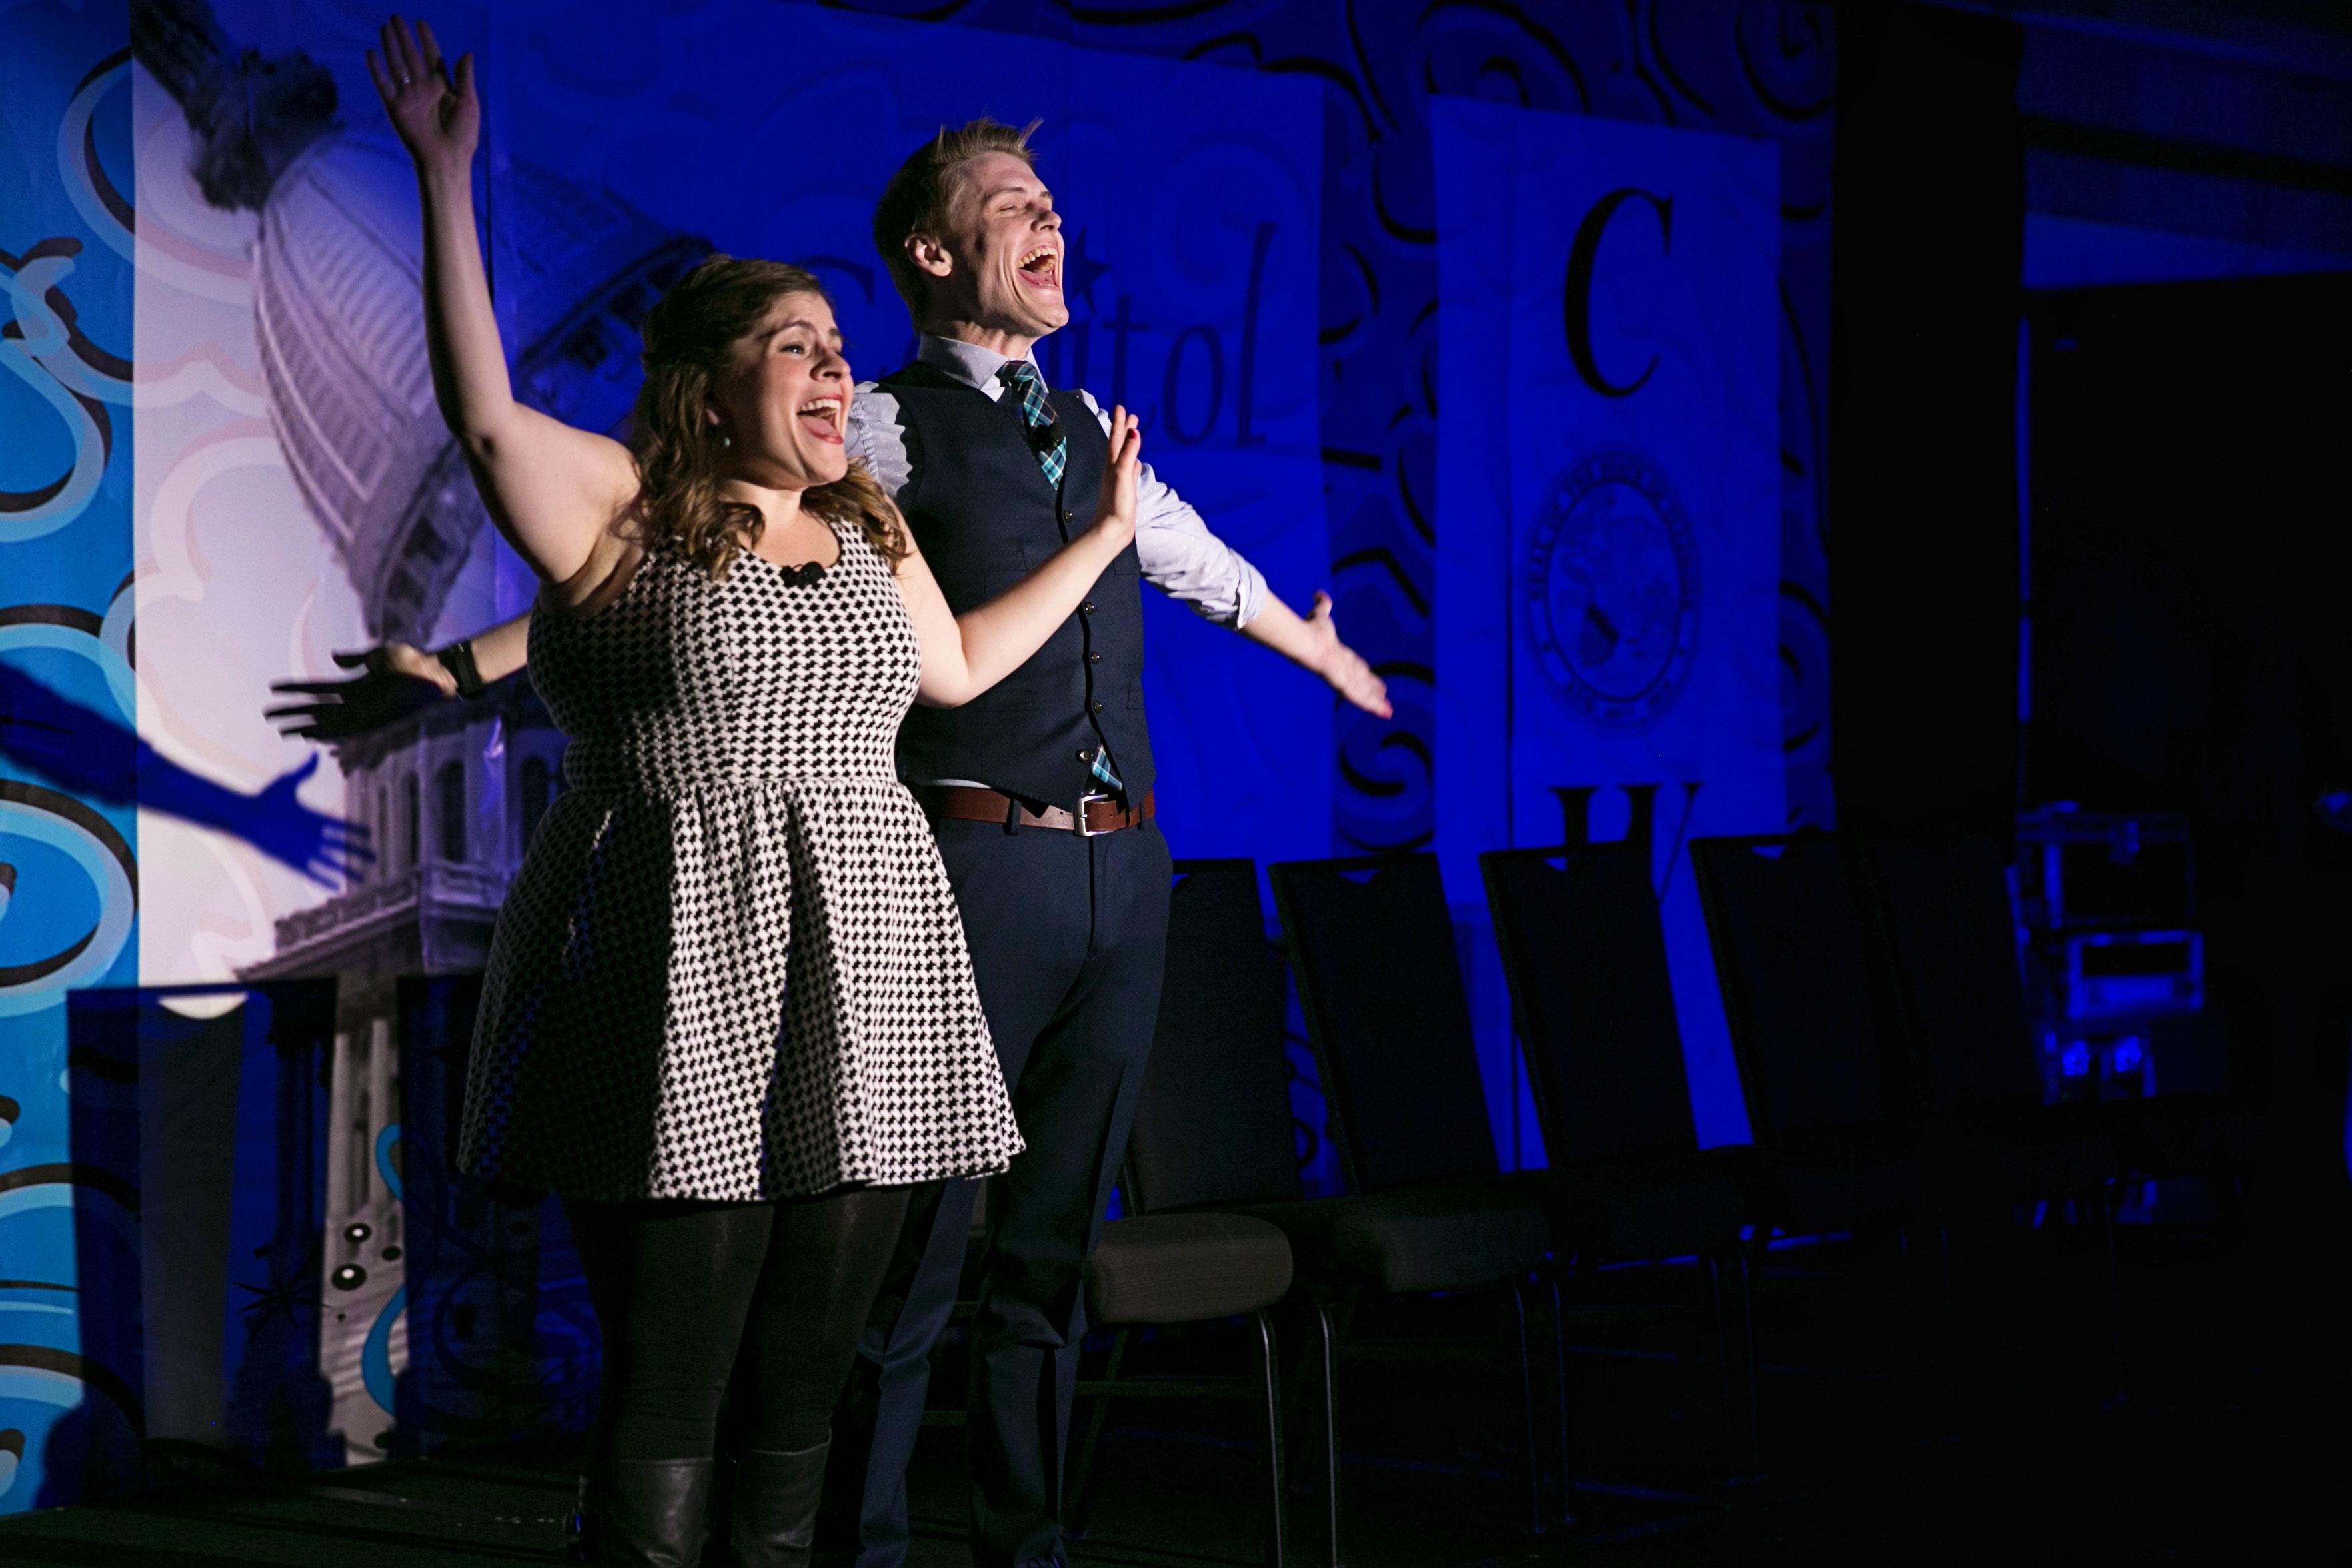 Second City cast members Jo Feldman and Adam Schreck performing a skit. Photo: Jason Johnson